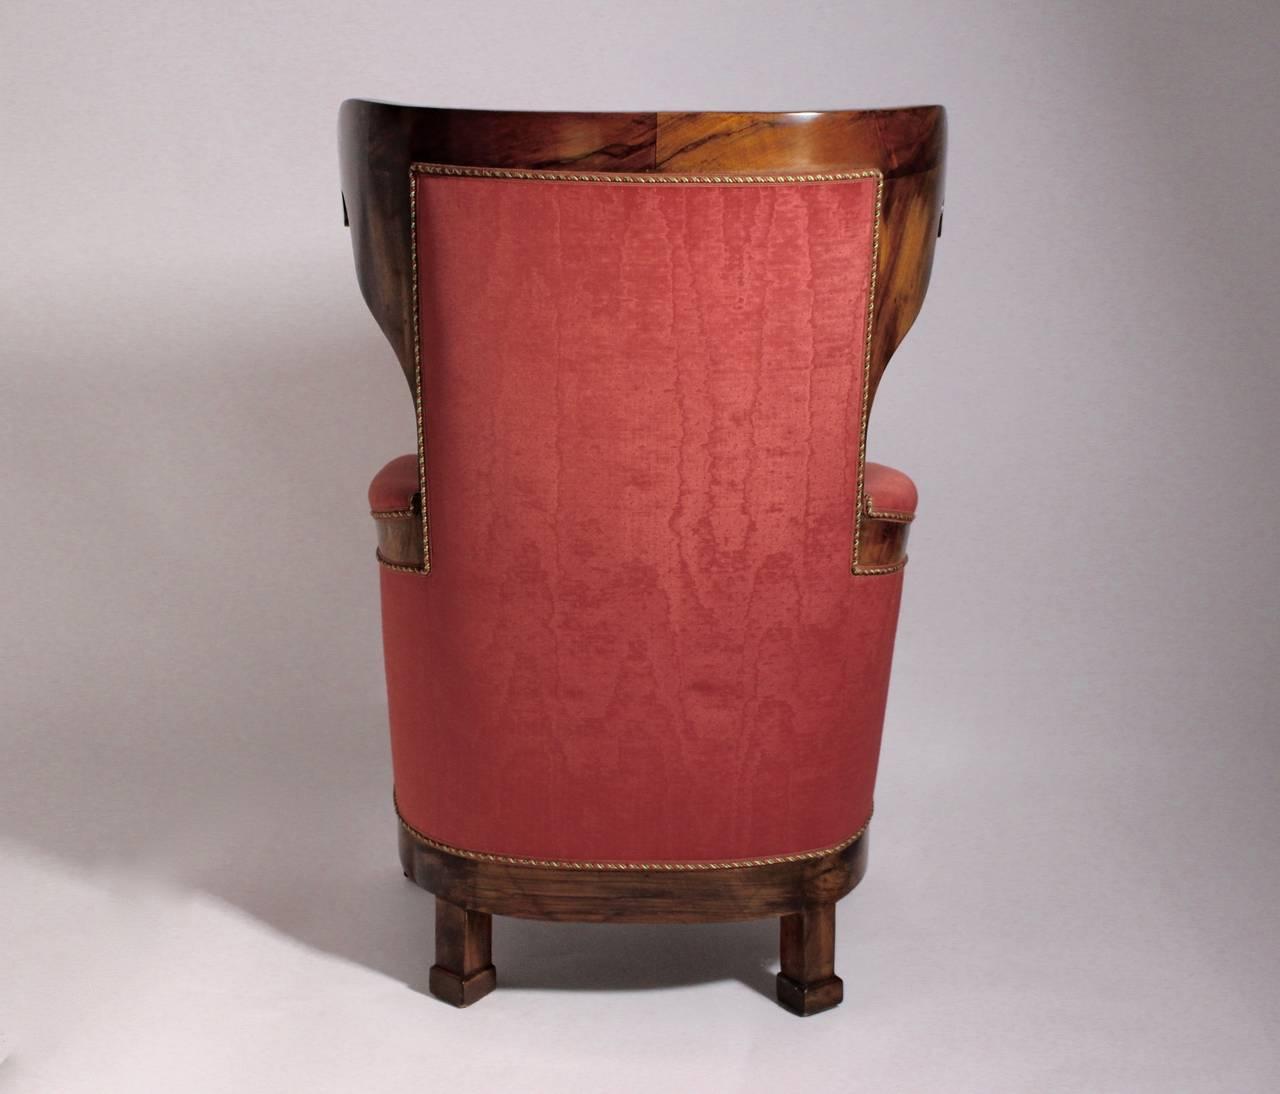 Veneer Biedermeier Walnut Wood Pink Fabric Wingback Chair circa 1825 Vienna For Sale